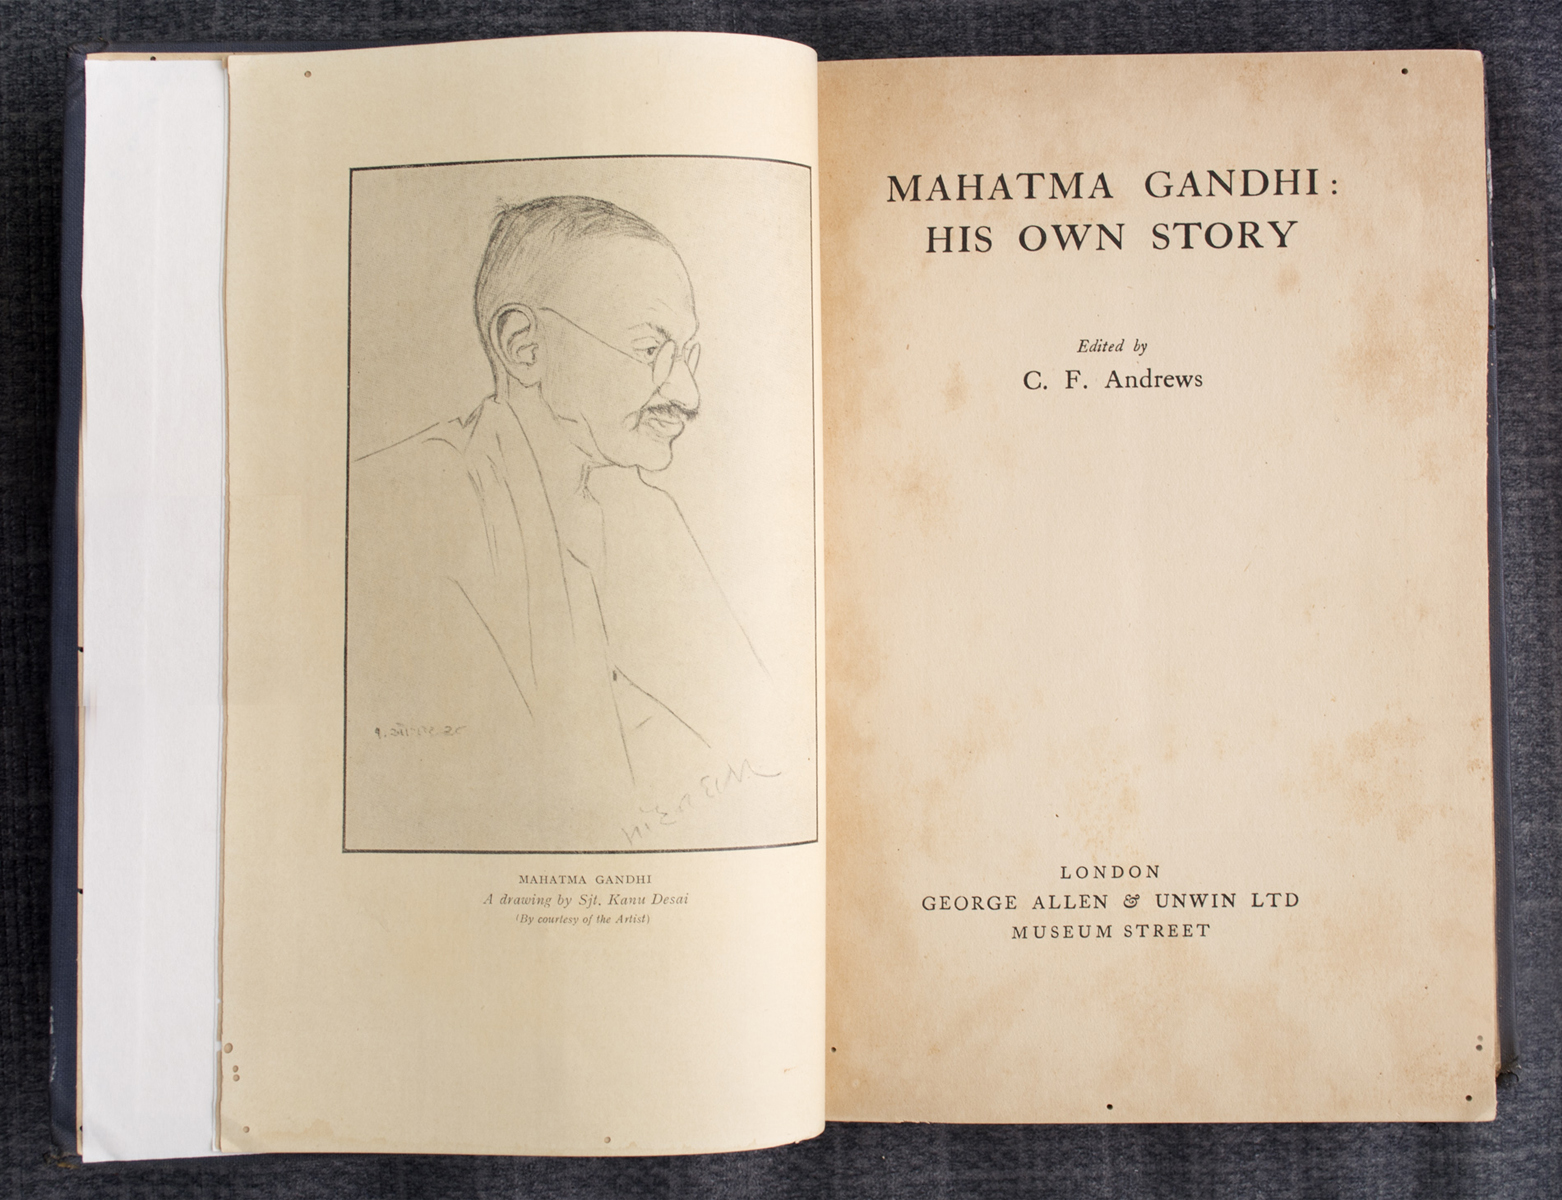 Mahatma Gandhi: His own story